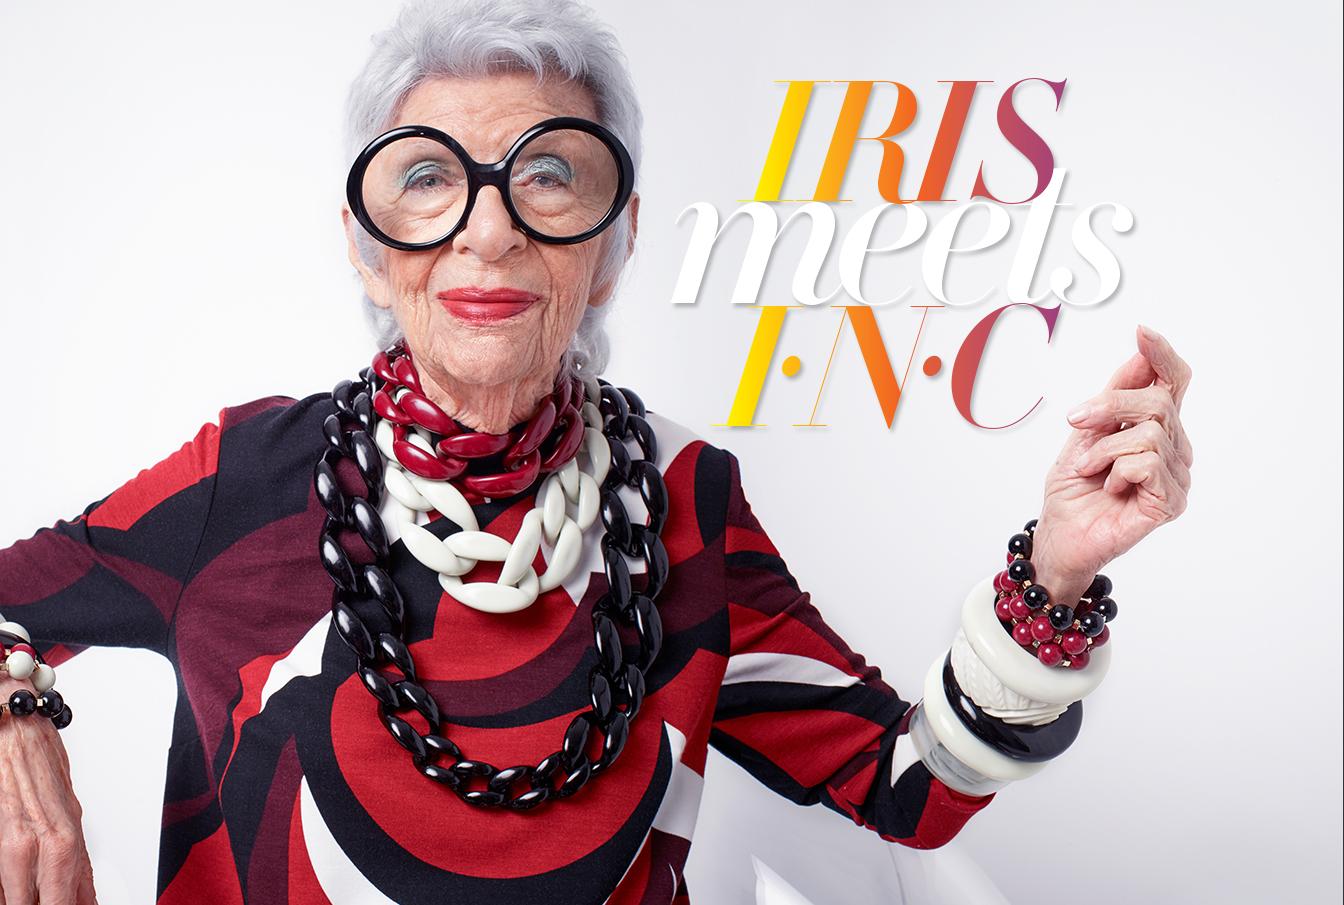 Iris meets inc